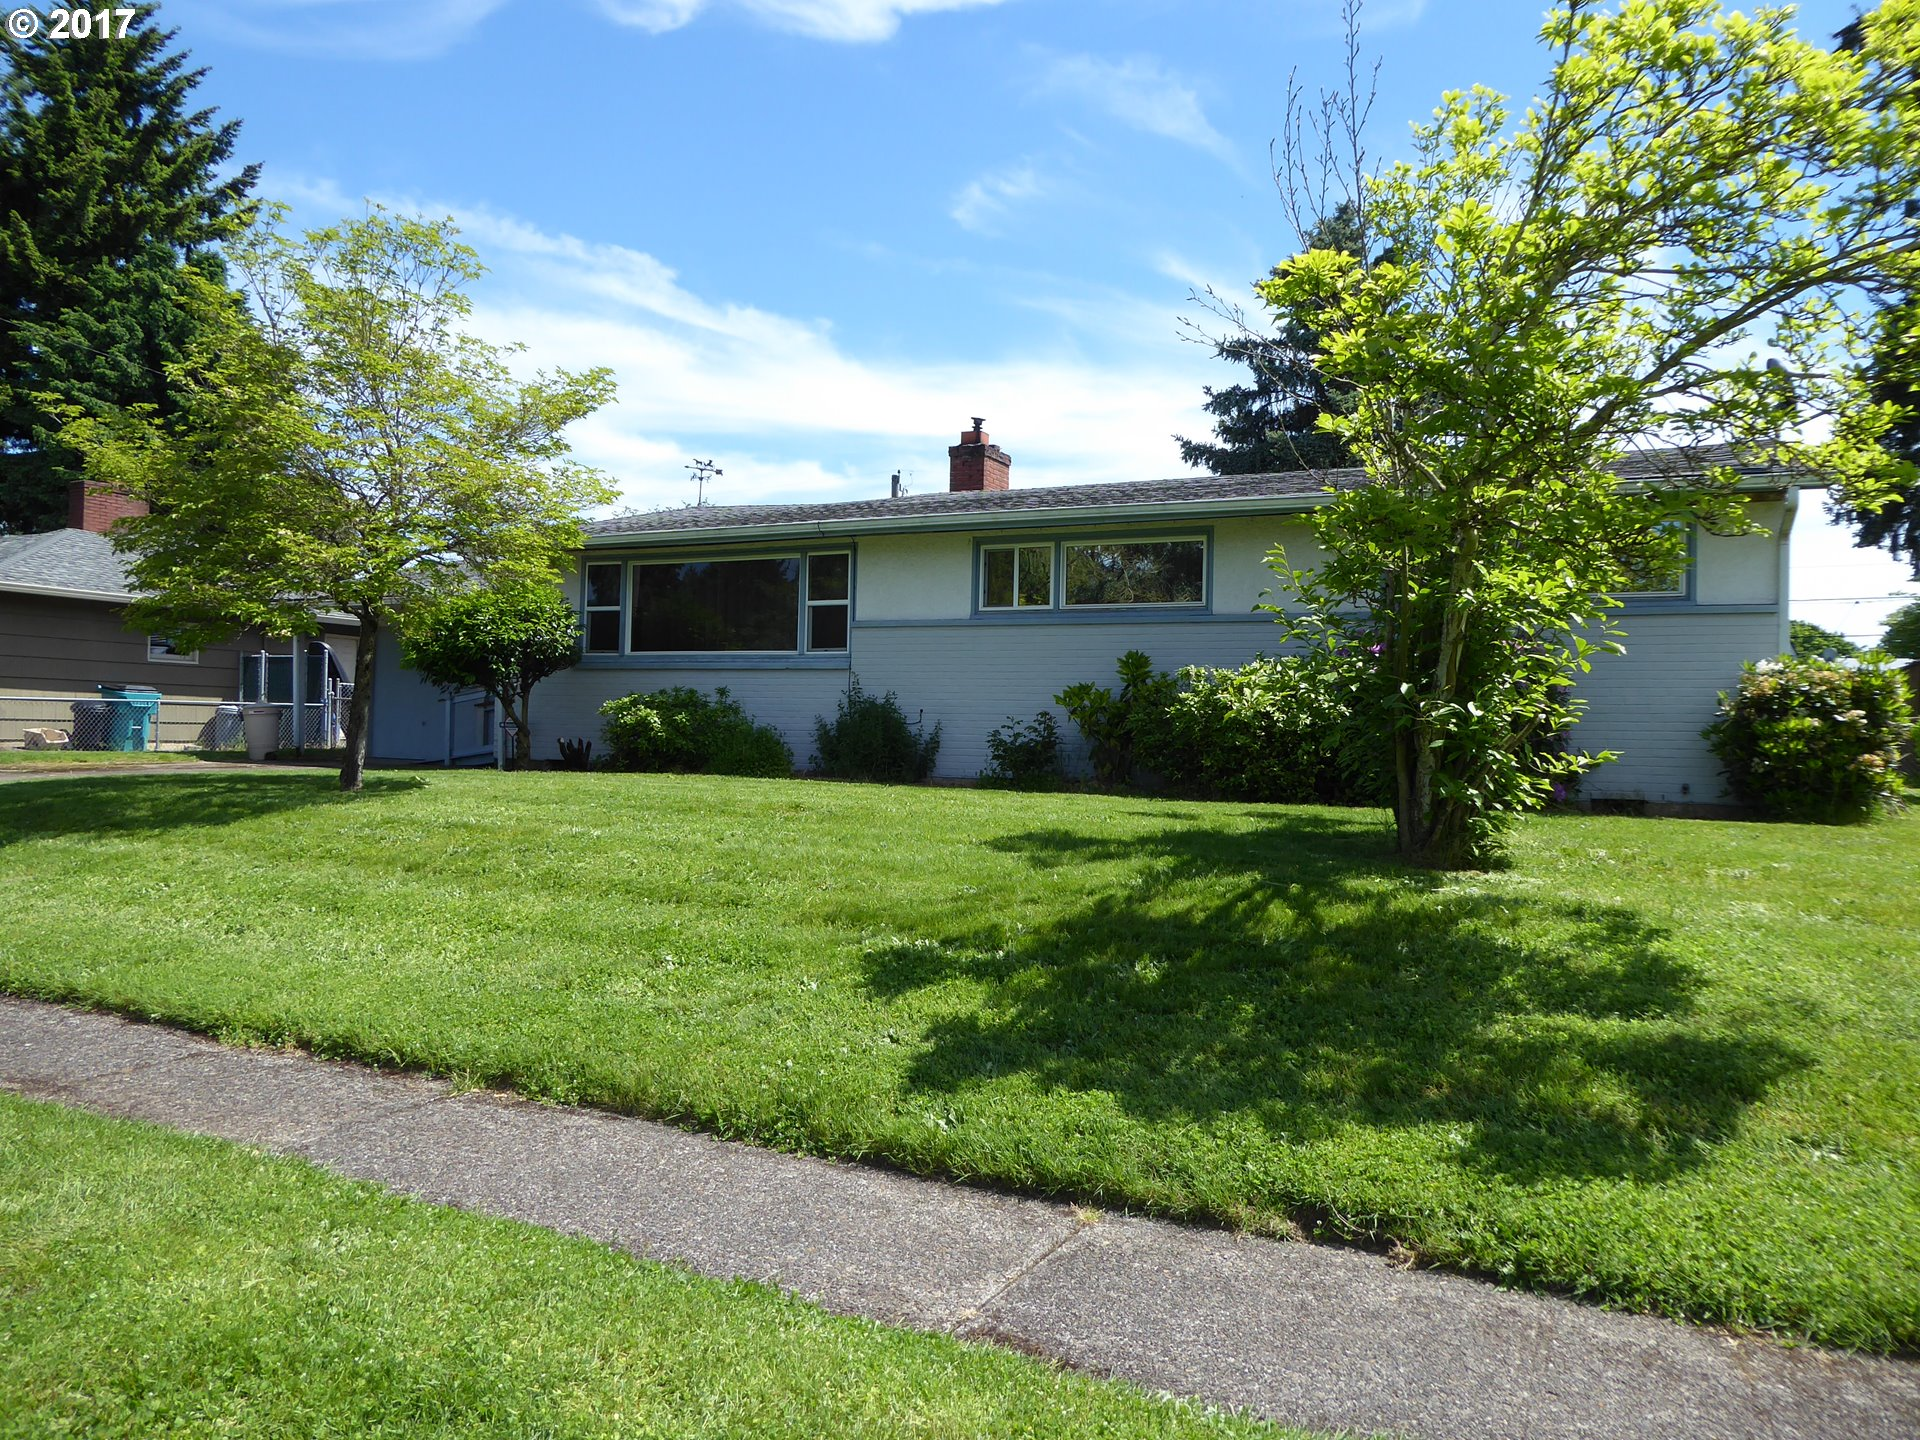 6415 NW FIRWOOD DR, Vancouver, WA 98665